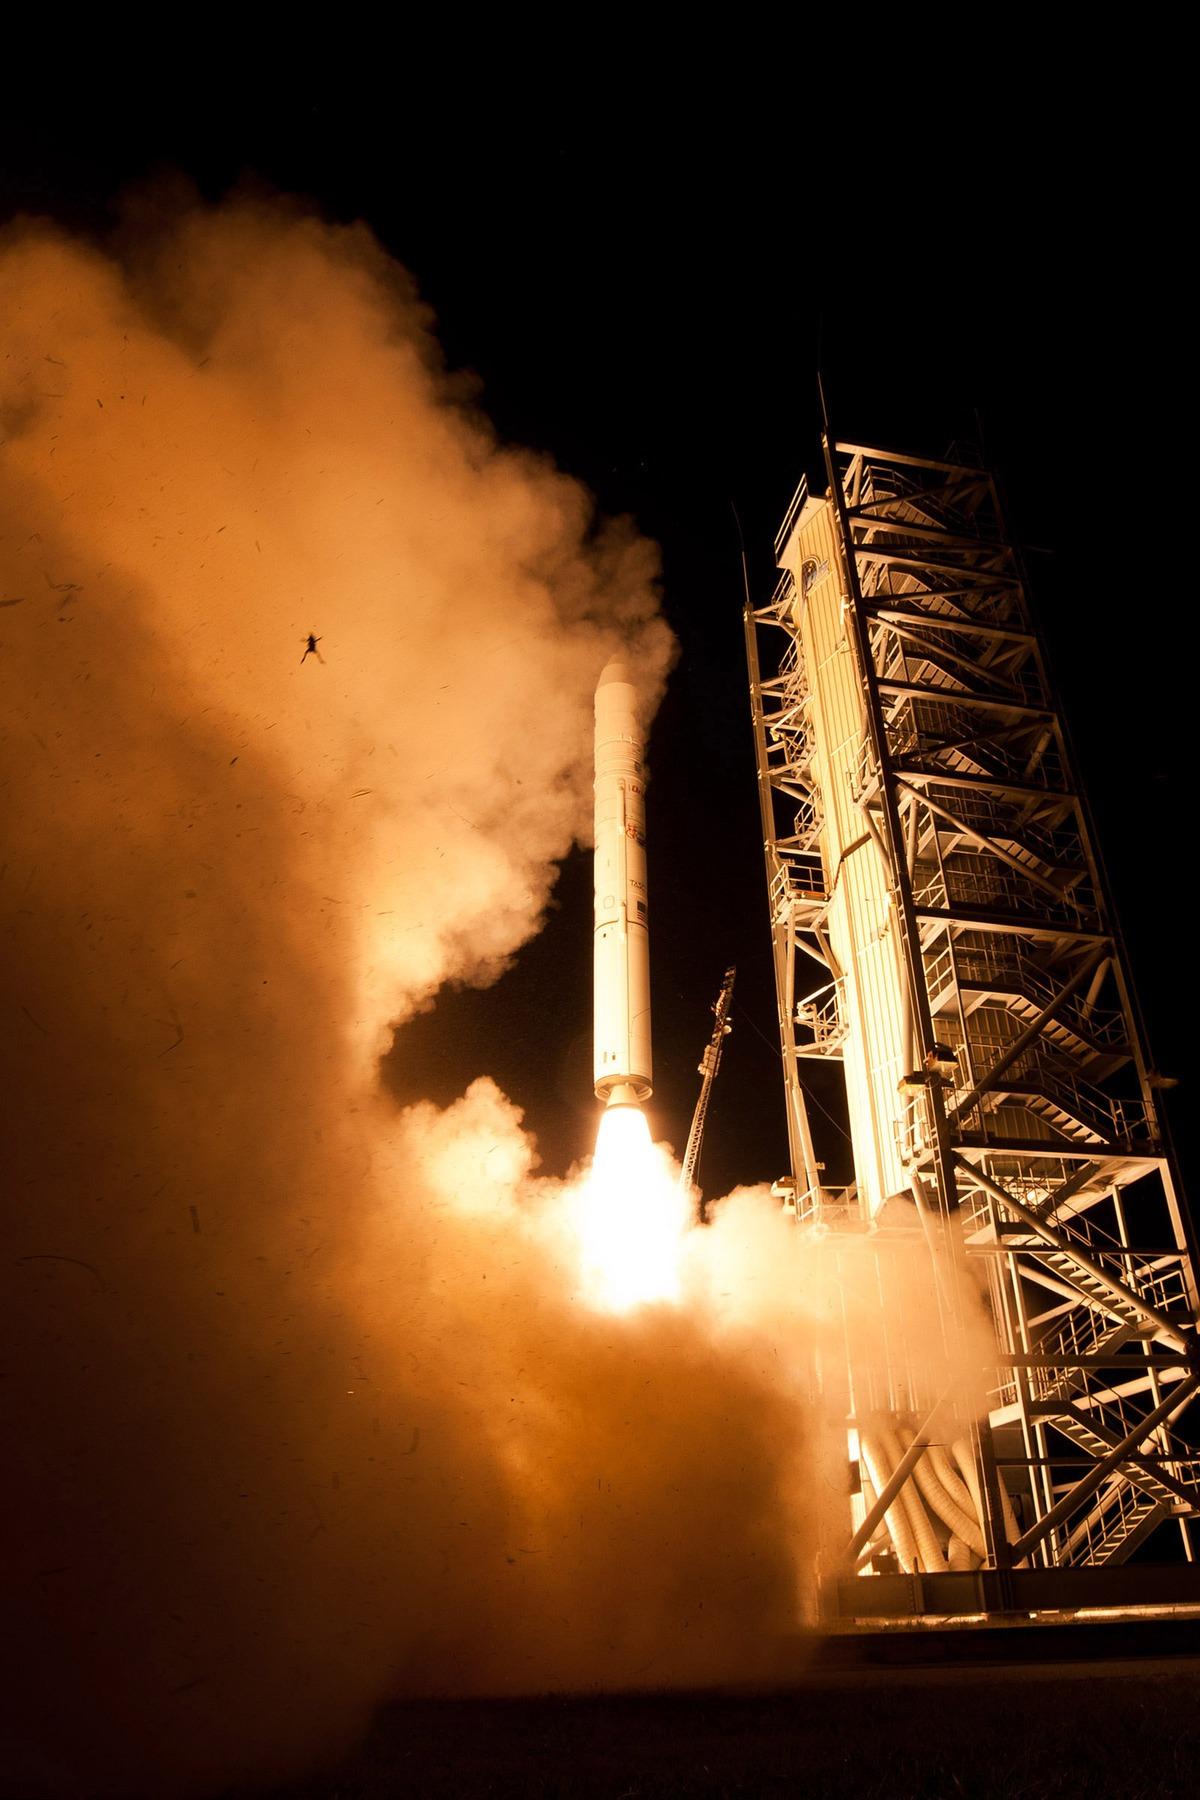 NASA FROG LAUNCH